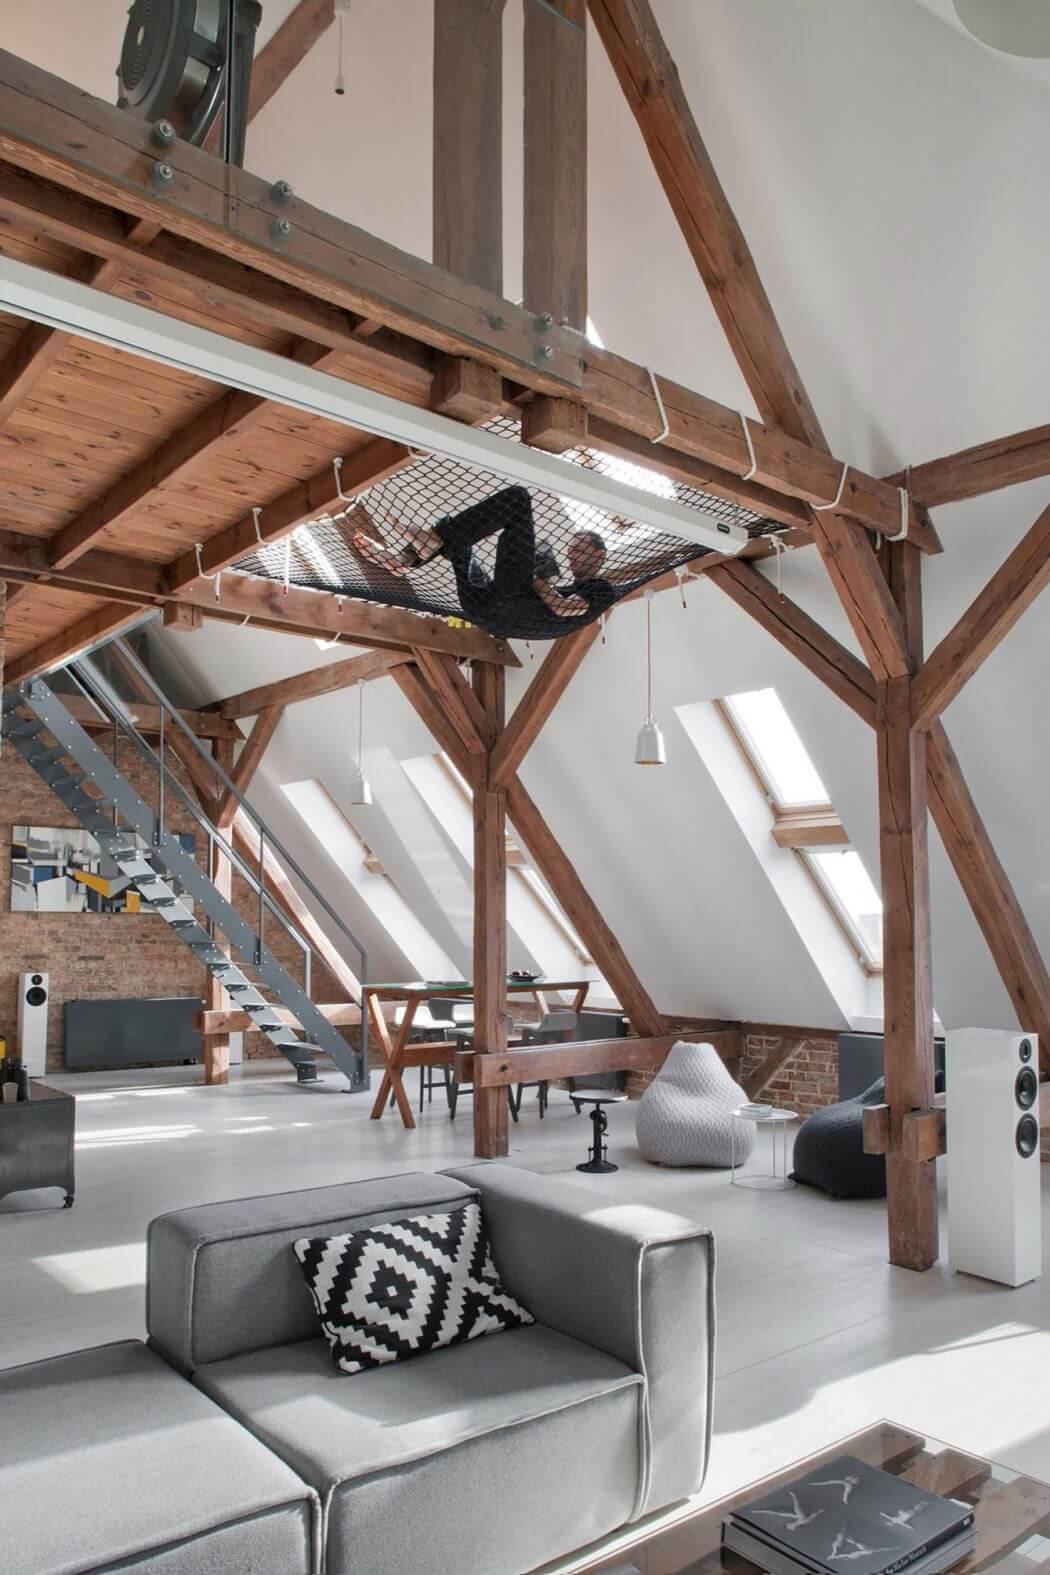 004-apartment-pozna-cuns-studio-designs_virlovastyle